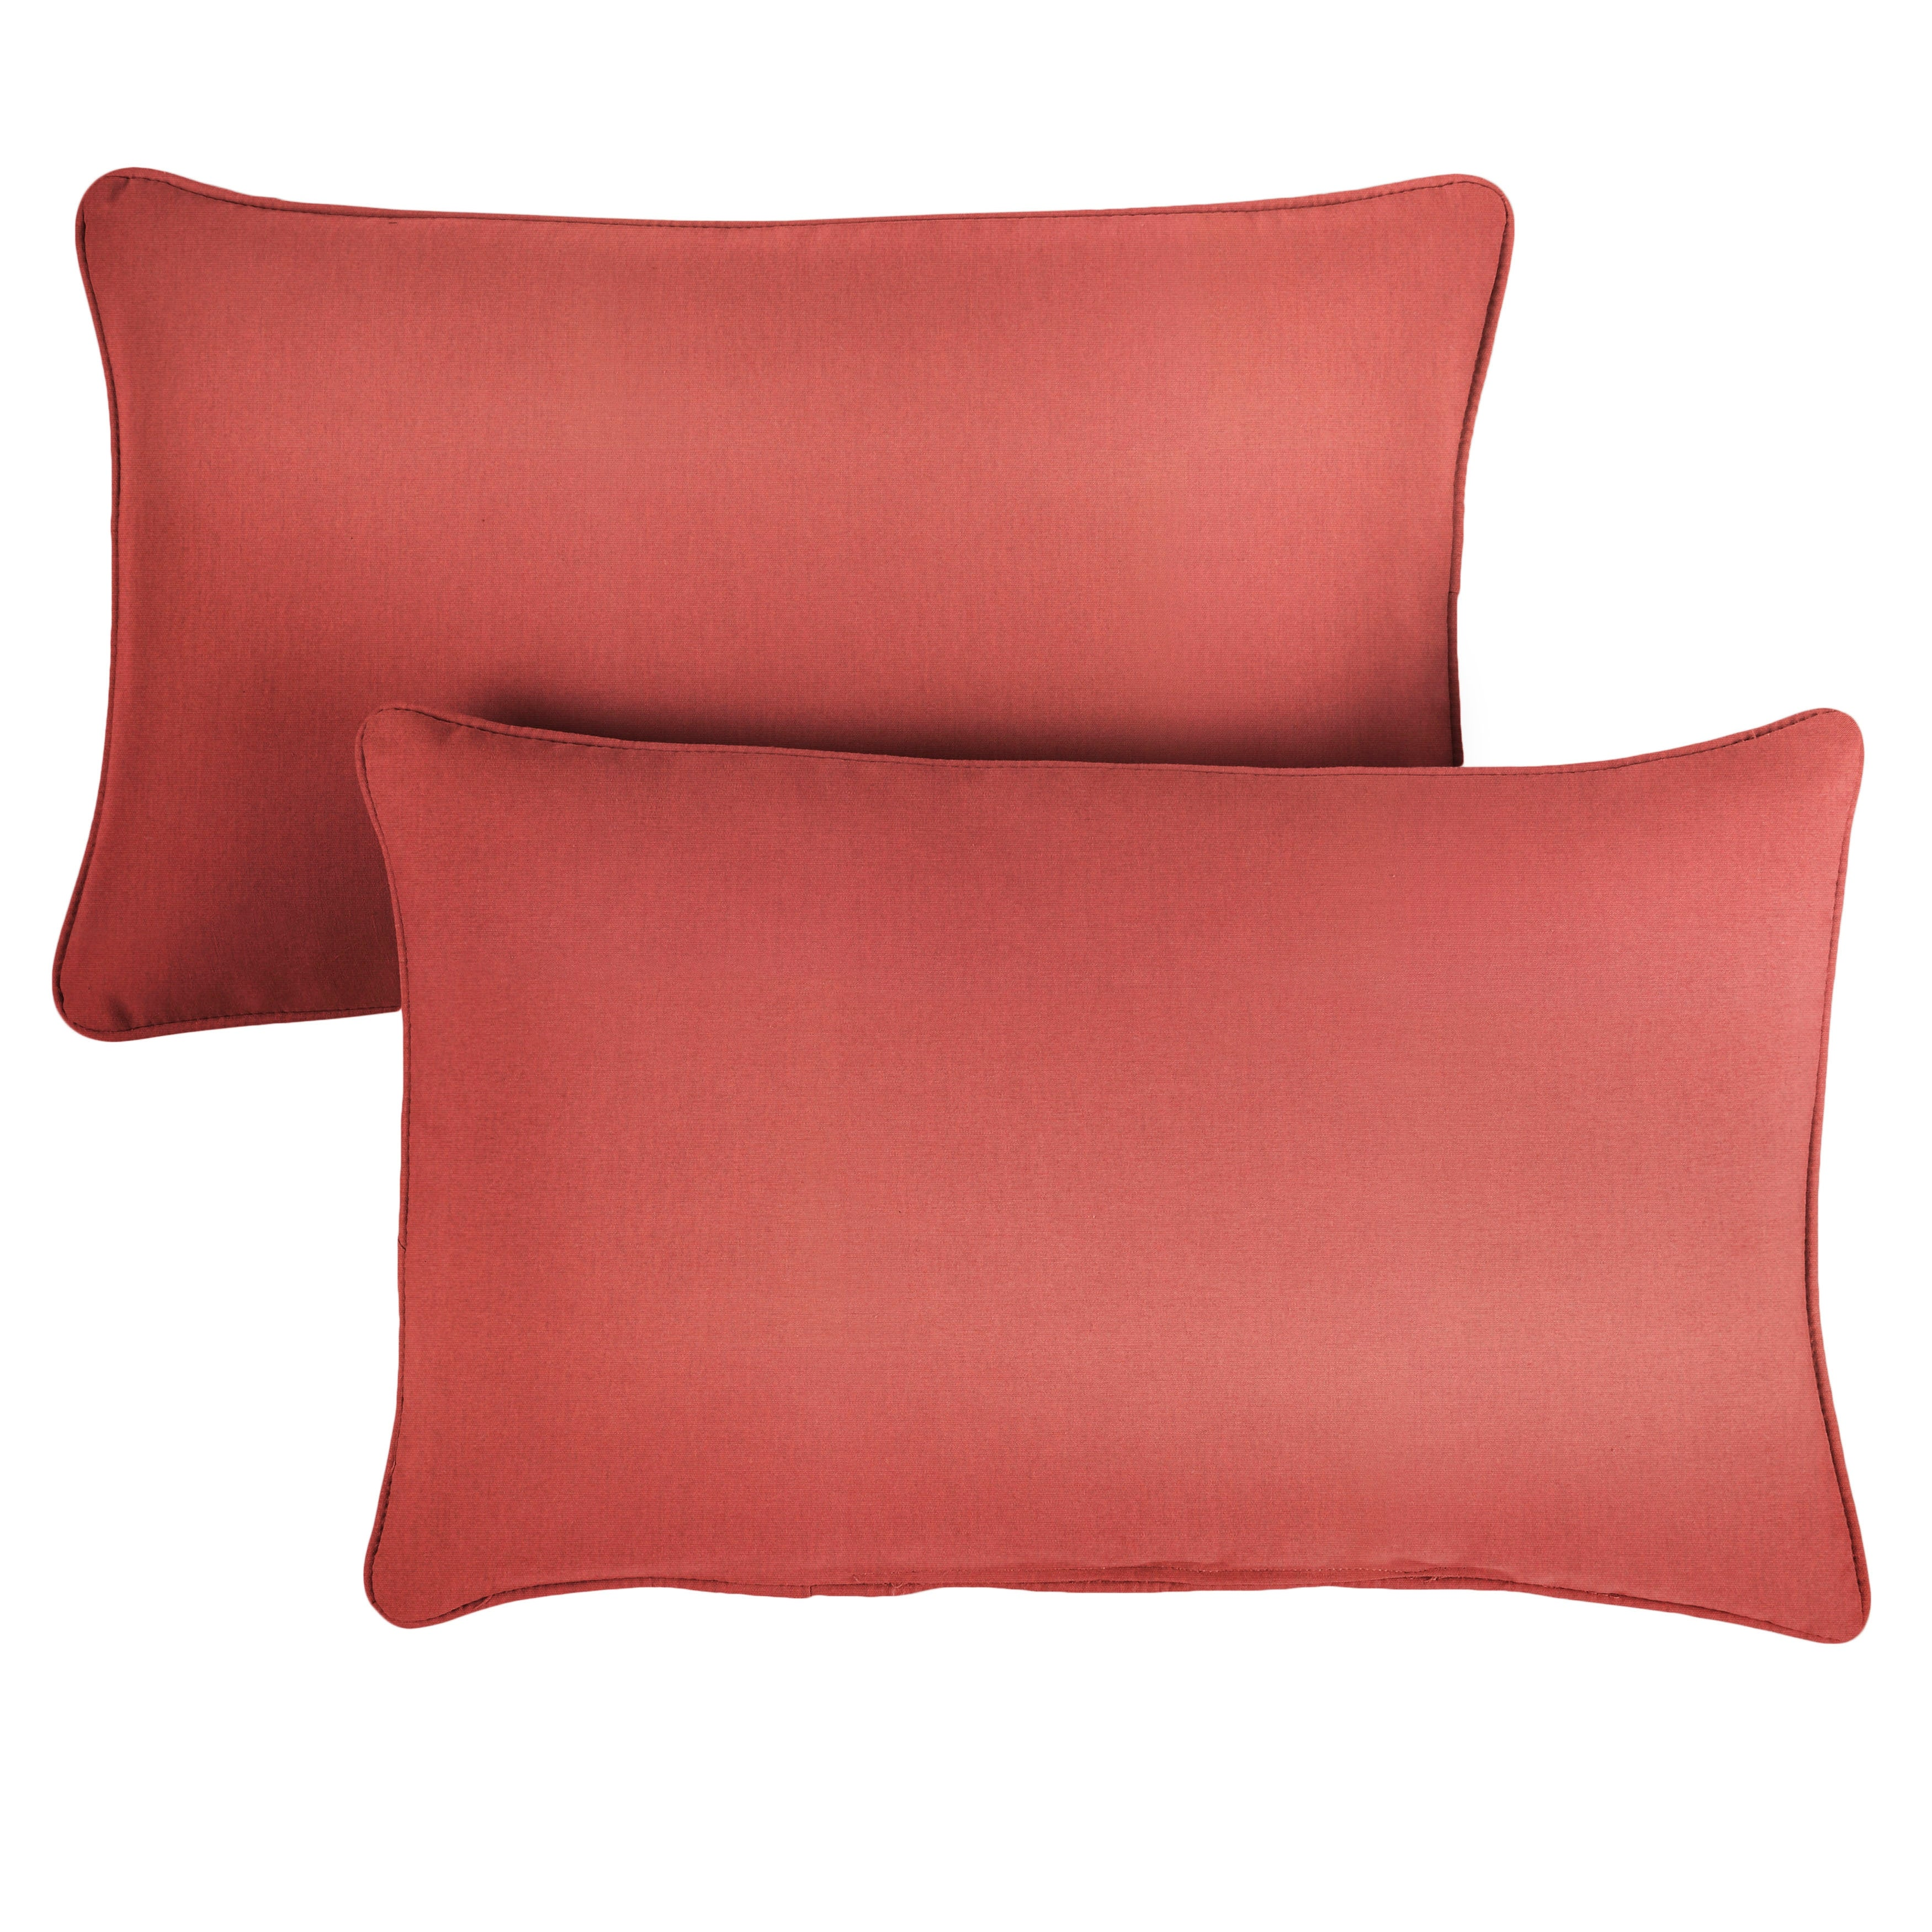 Sunbrella Canvas Henna Corded Indoor Outdoor Pillows Set Of 2 On Sale Overstock 27739967